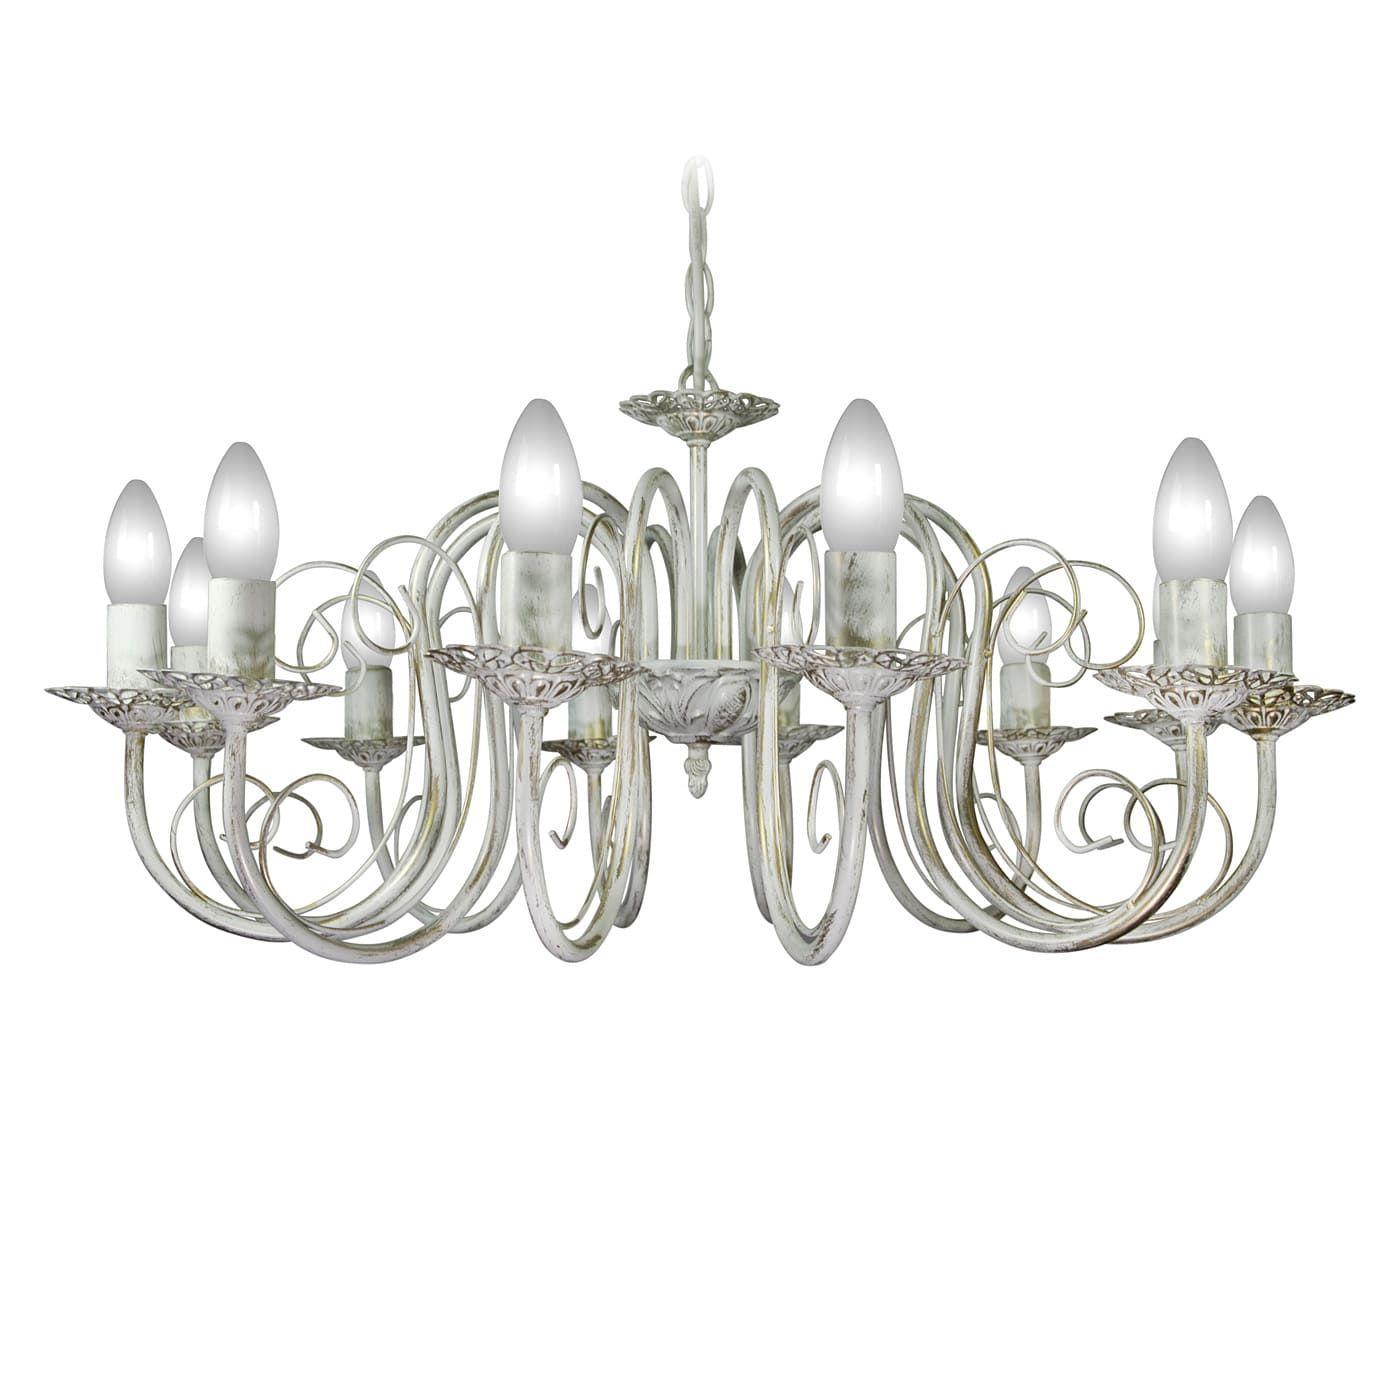 PETRASVET / Pendant chandelier S1170-12, 12xE14 max. 60W